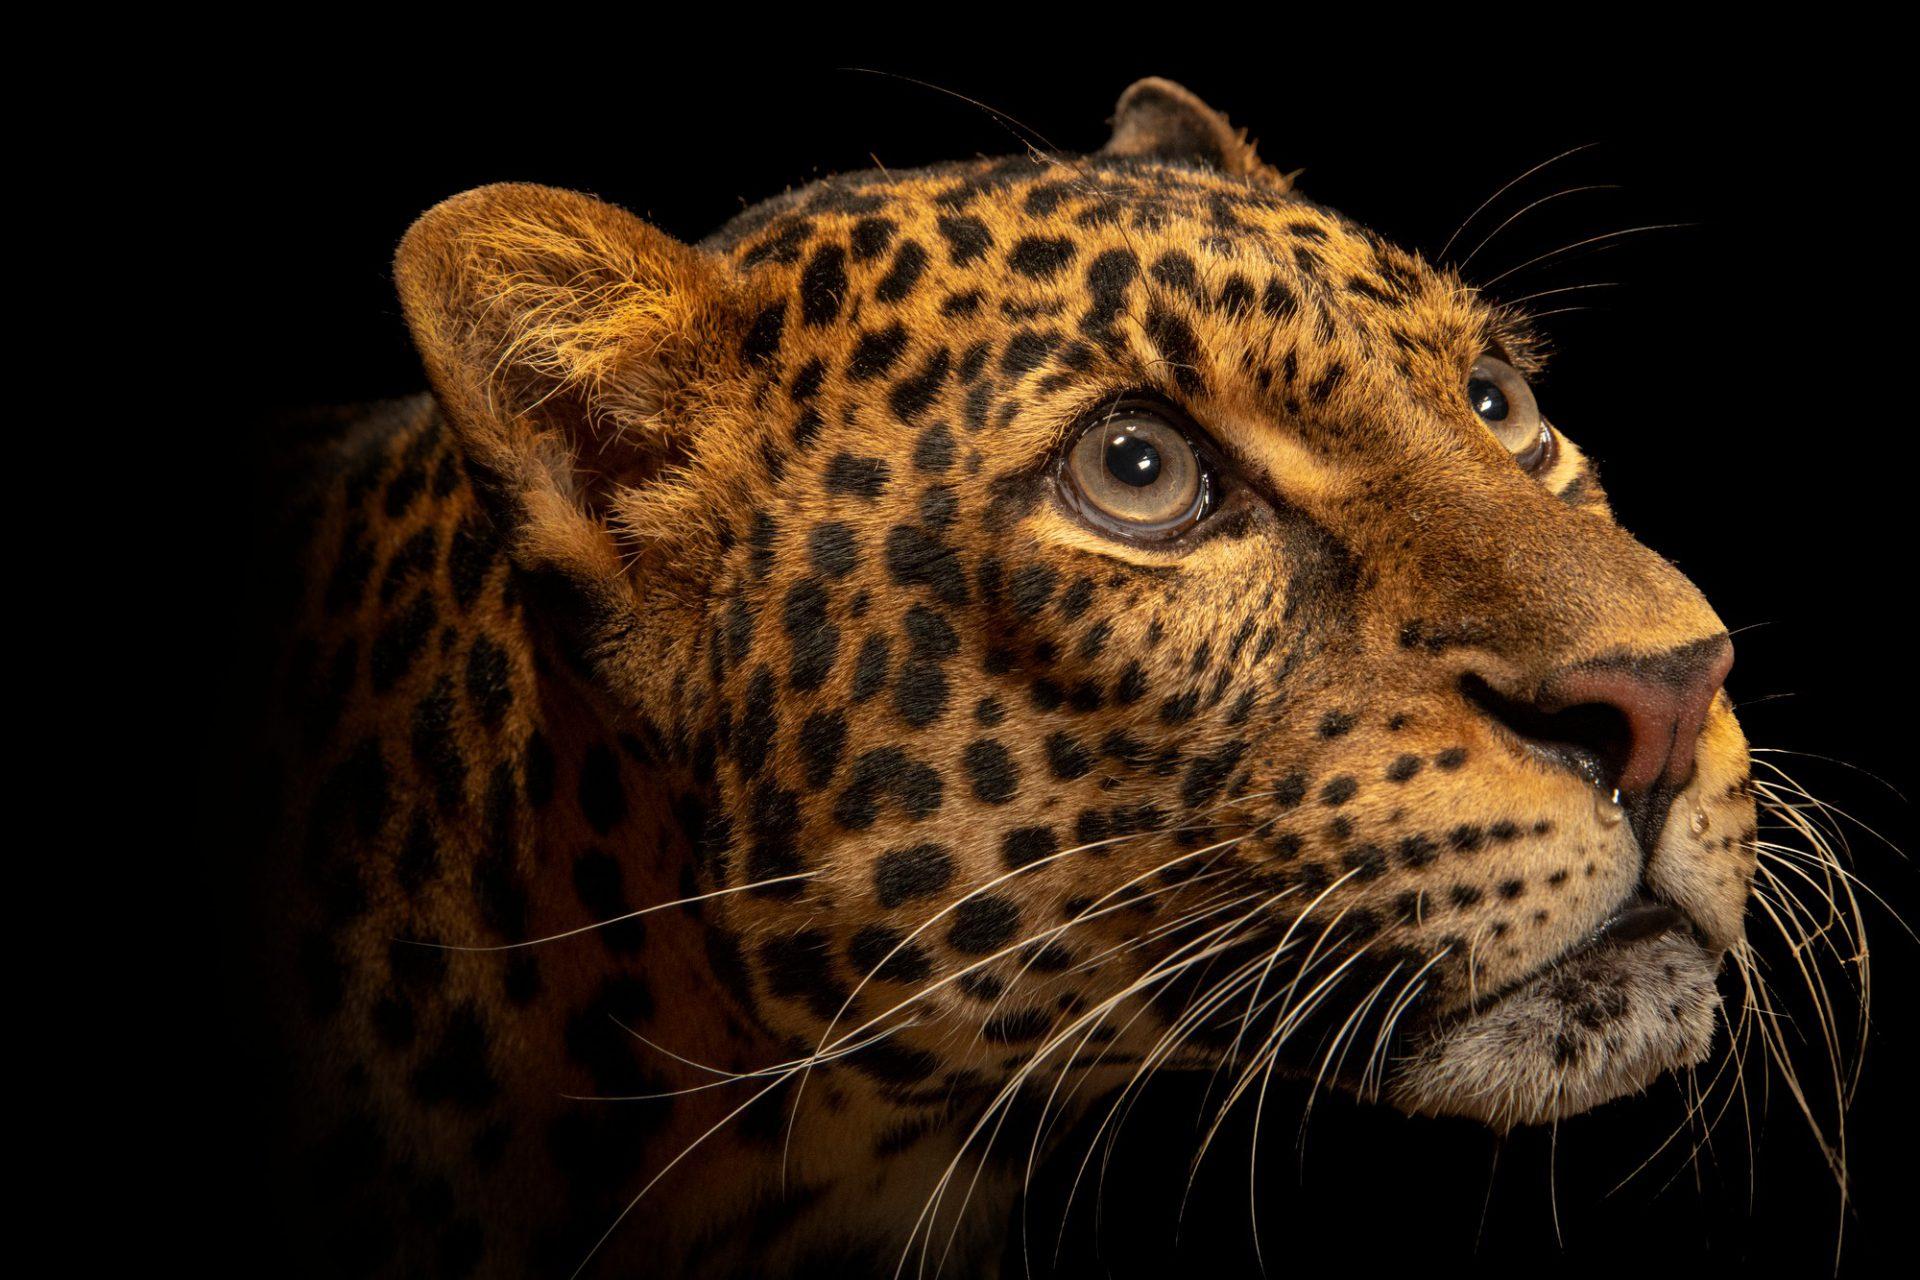 Photo: A critically endangered Javan leopard (Panthera pardus melas) at Taman Safari.